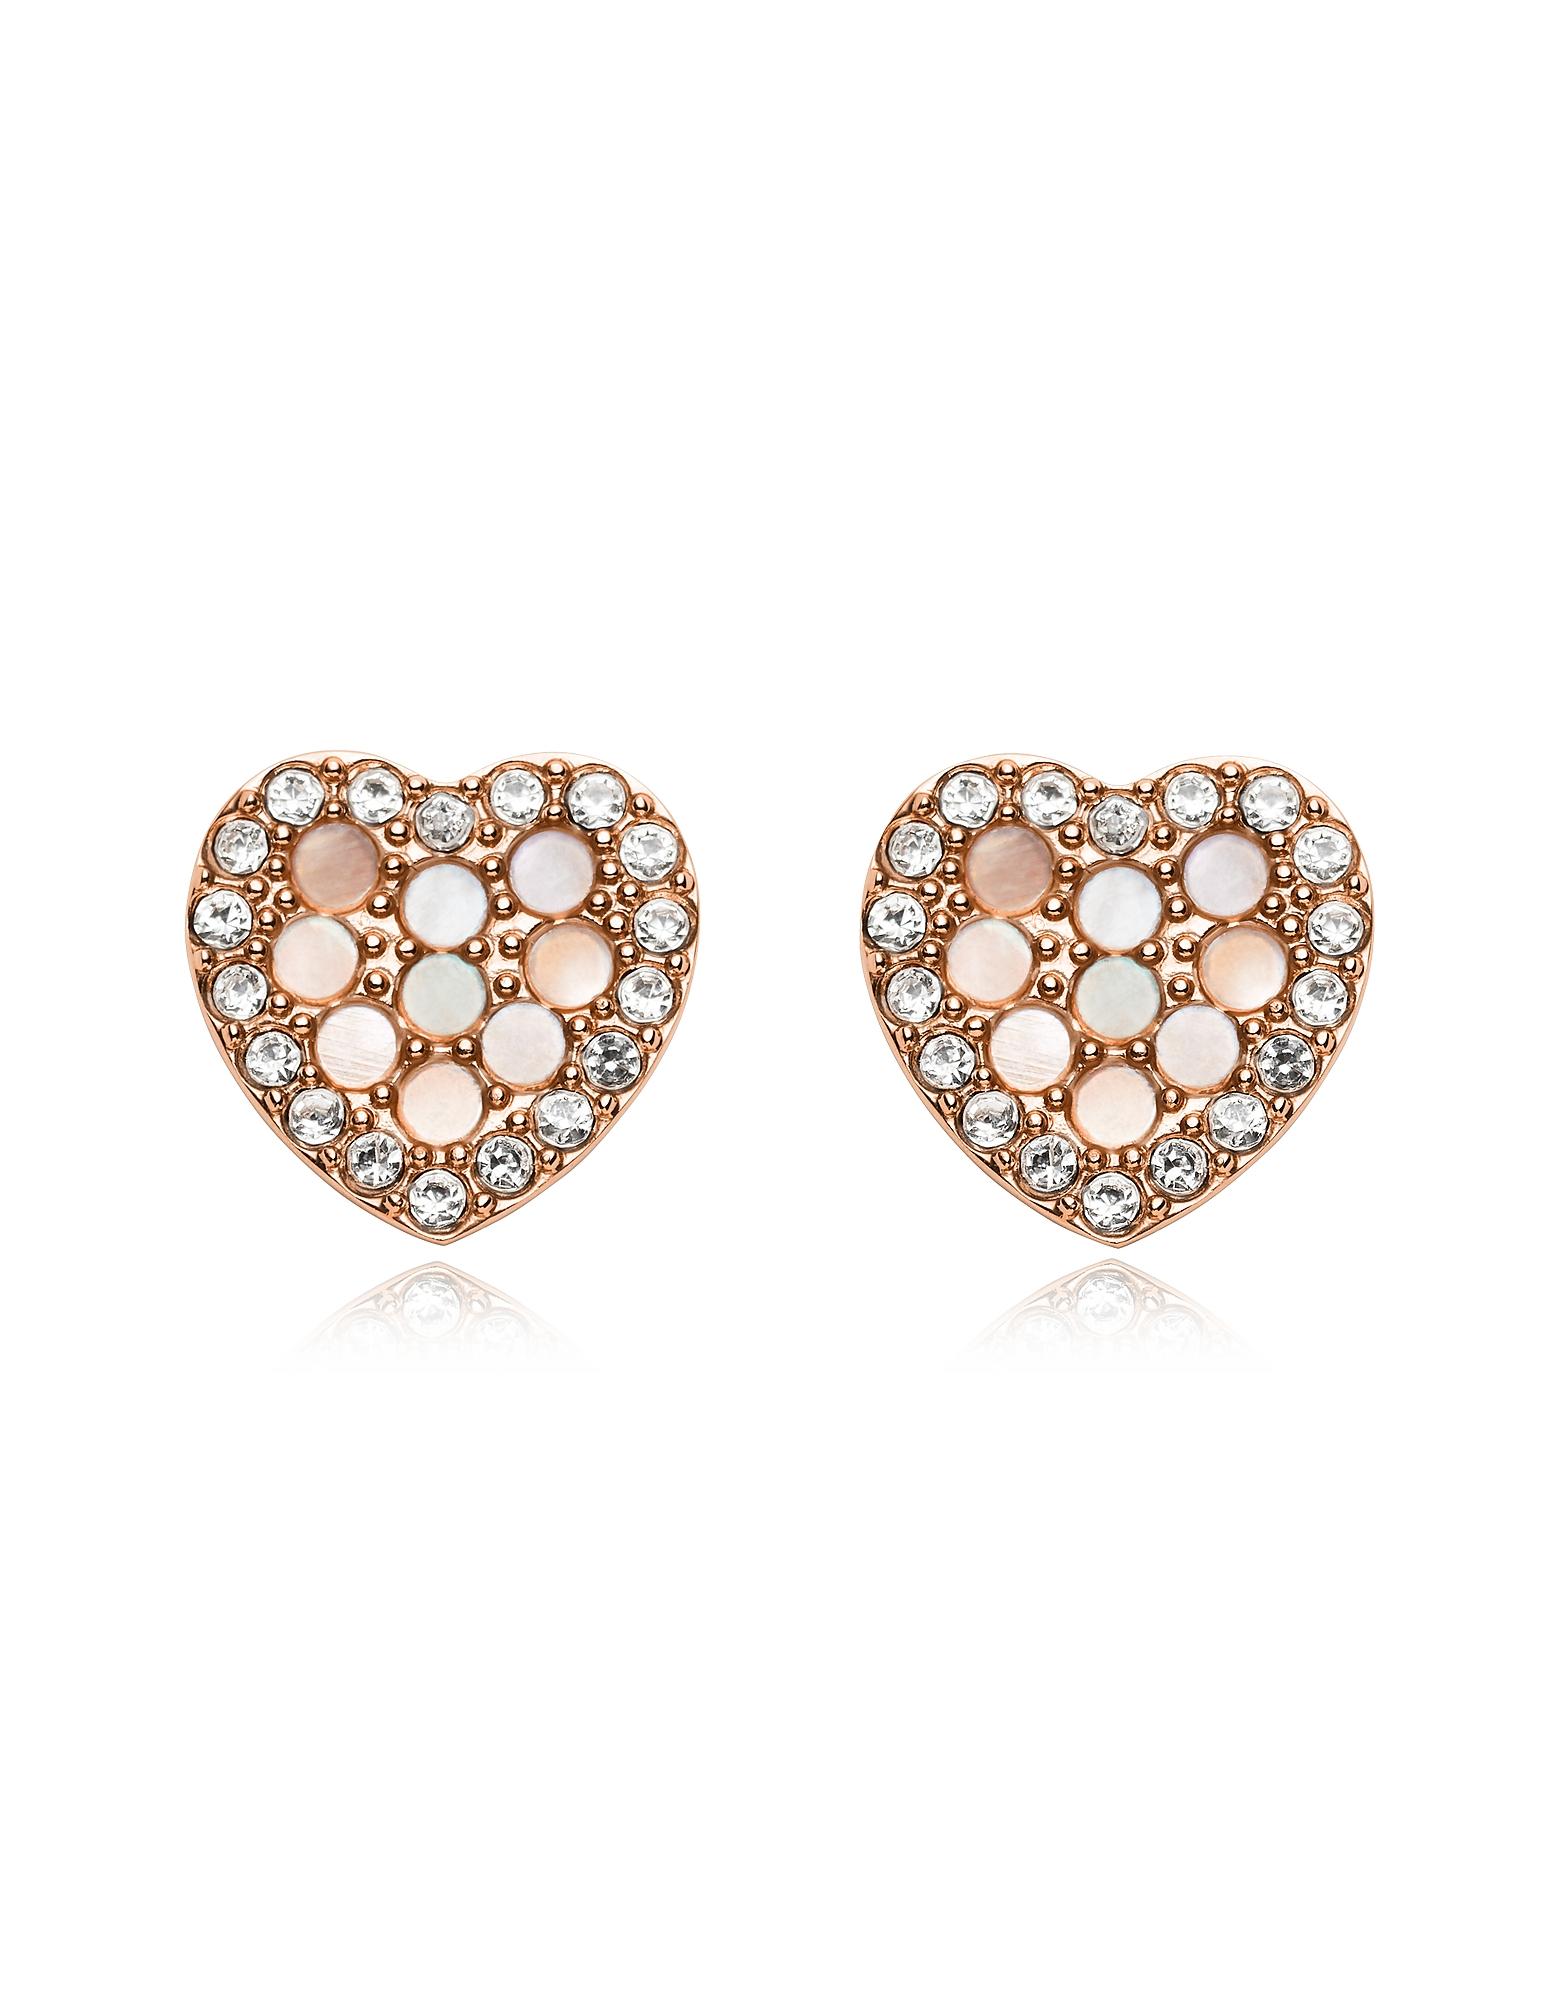 Mosaic Glitz Heart Rose Tone Earrings, Rose gold